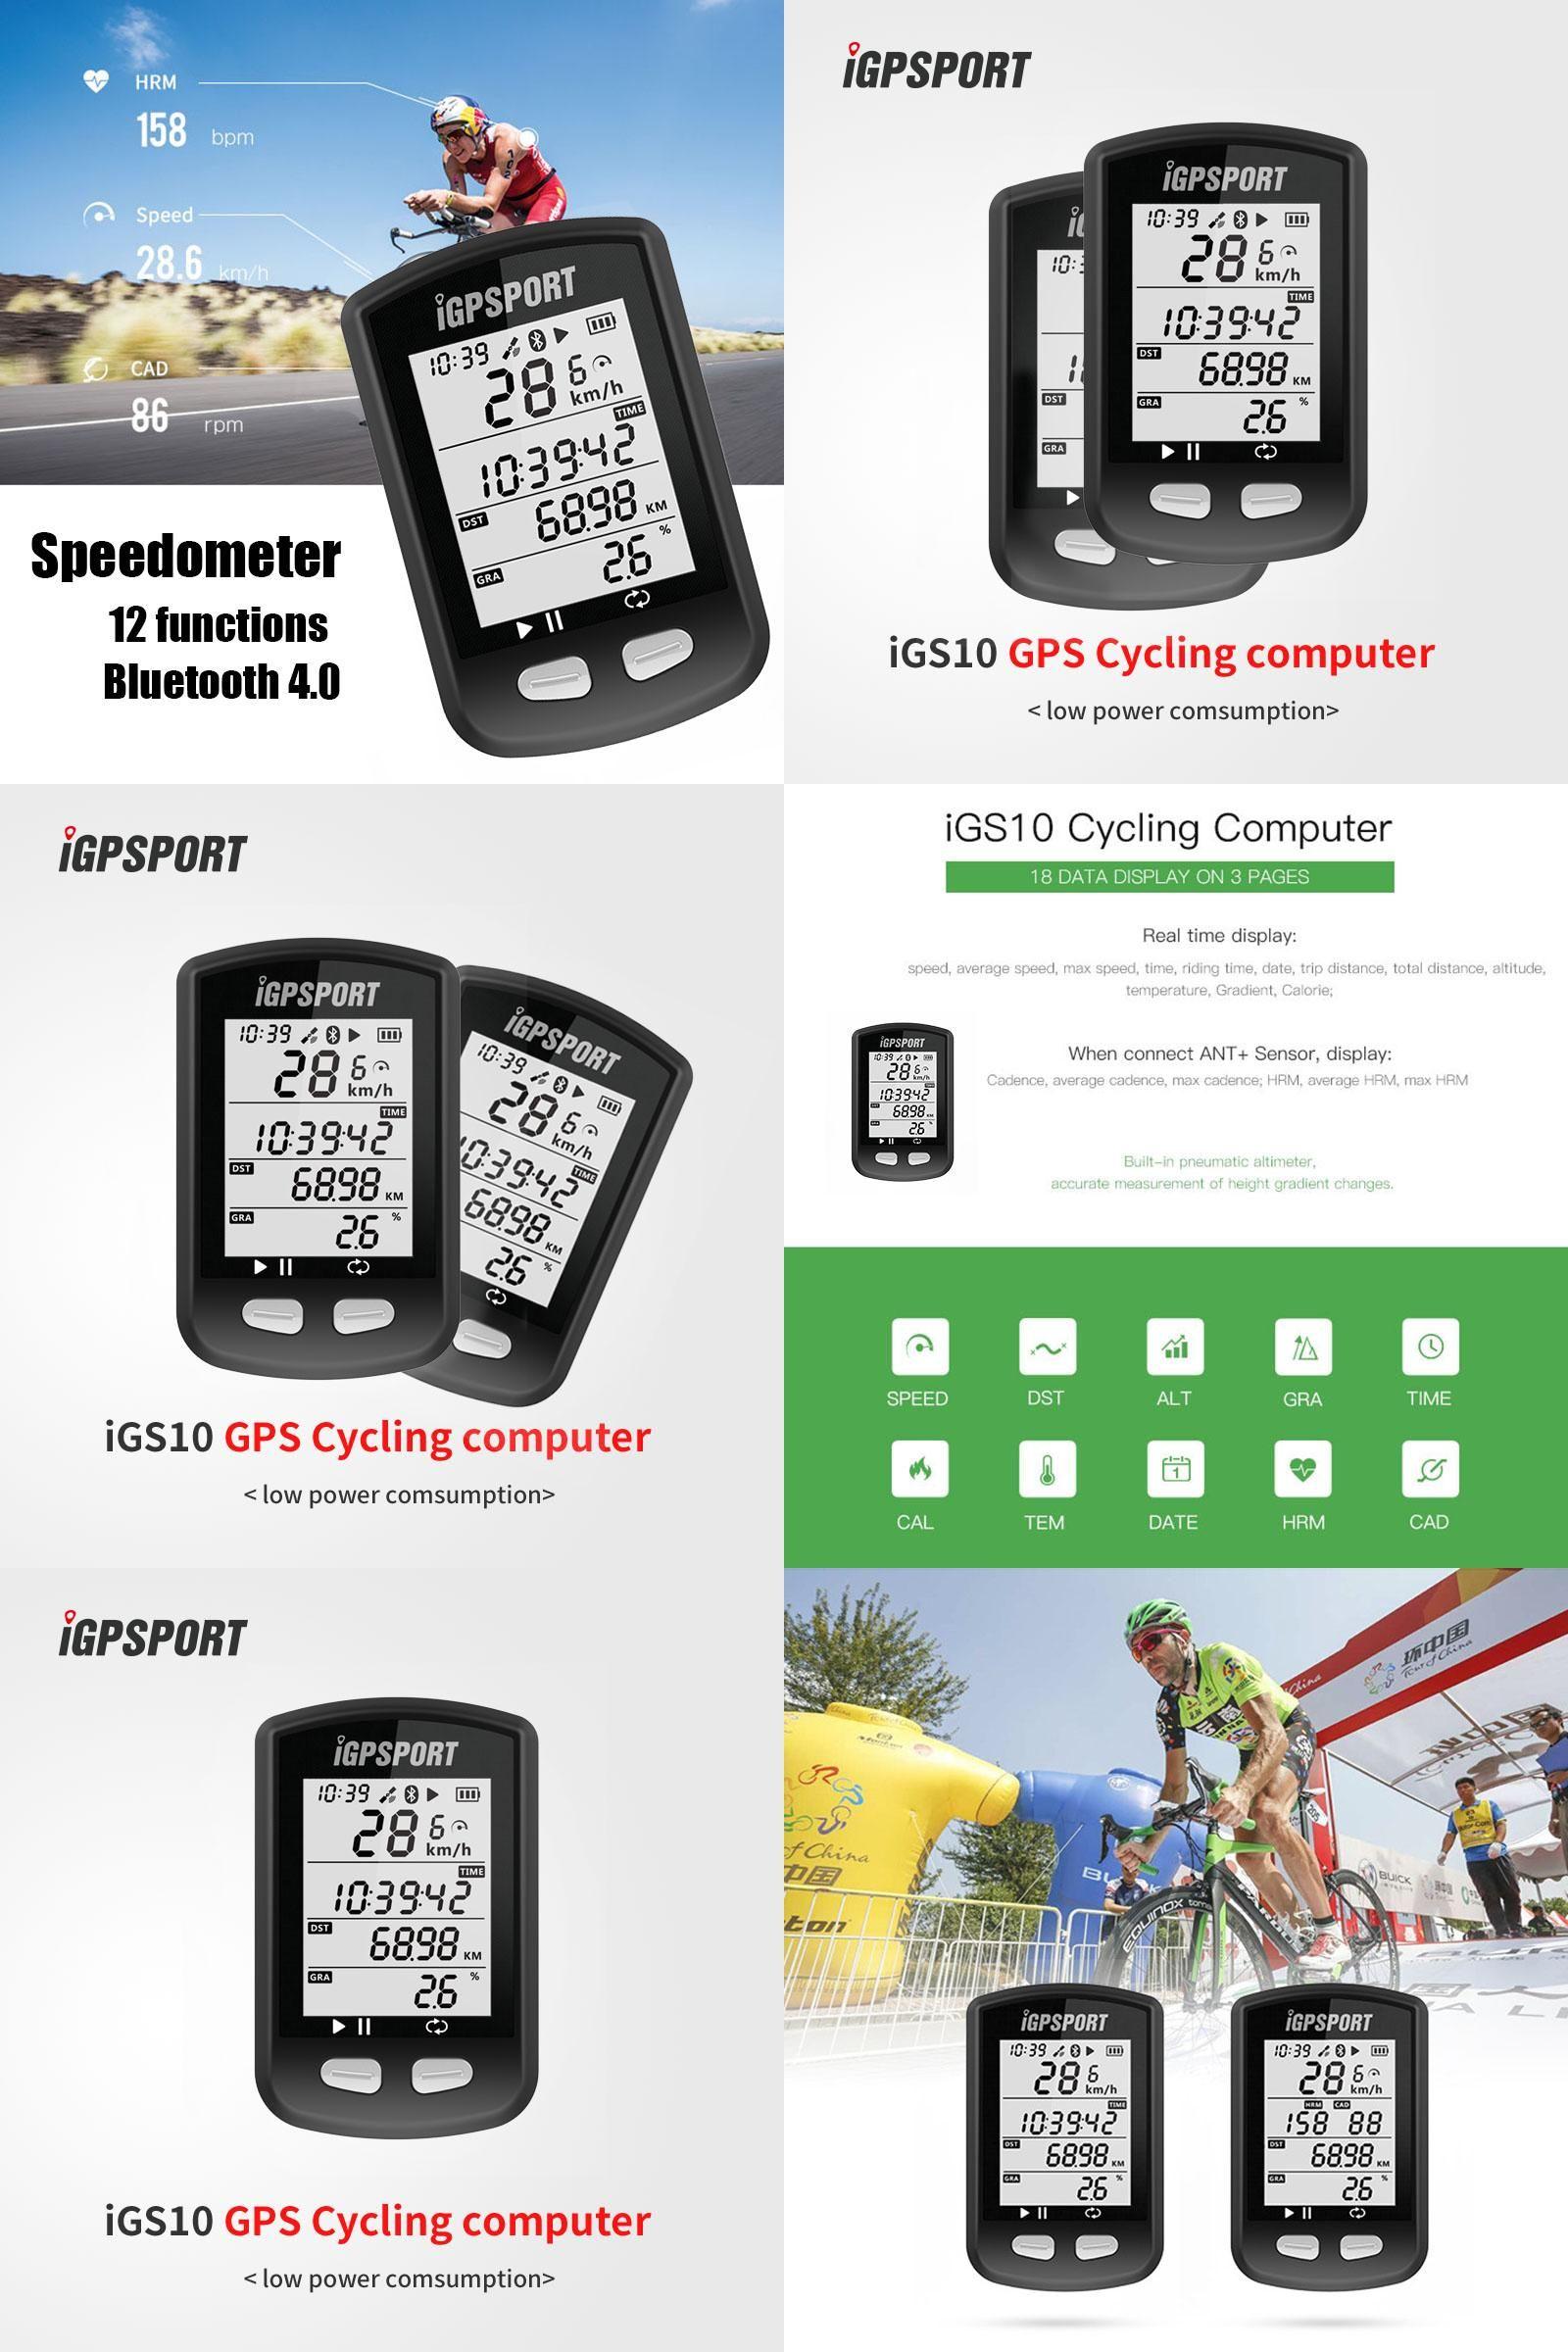 Visit to Buy] igpsport iGS10 GPS Cycling Computer MTB Waterproof ...